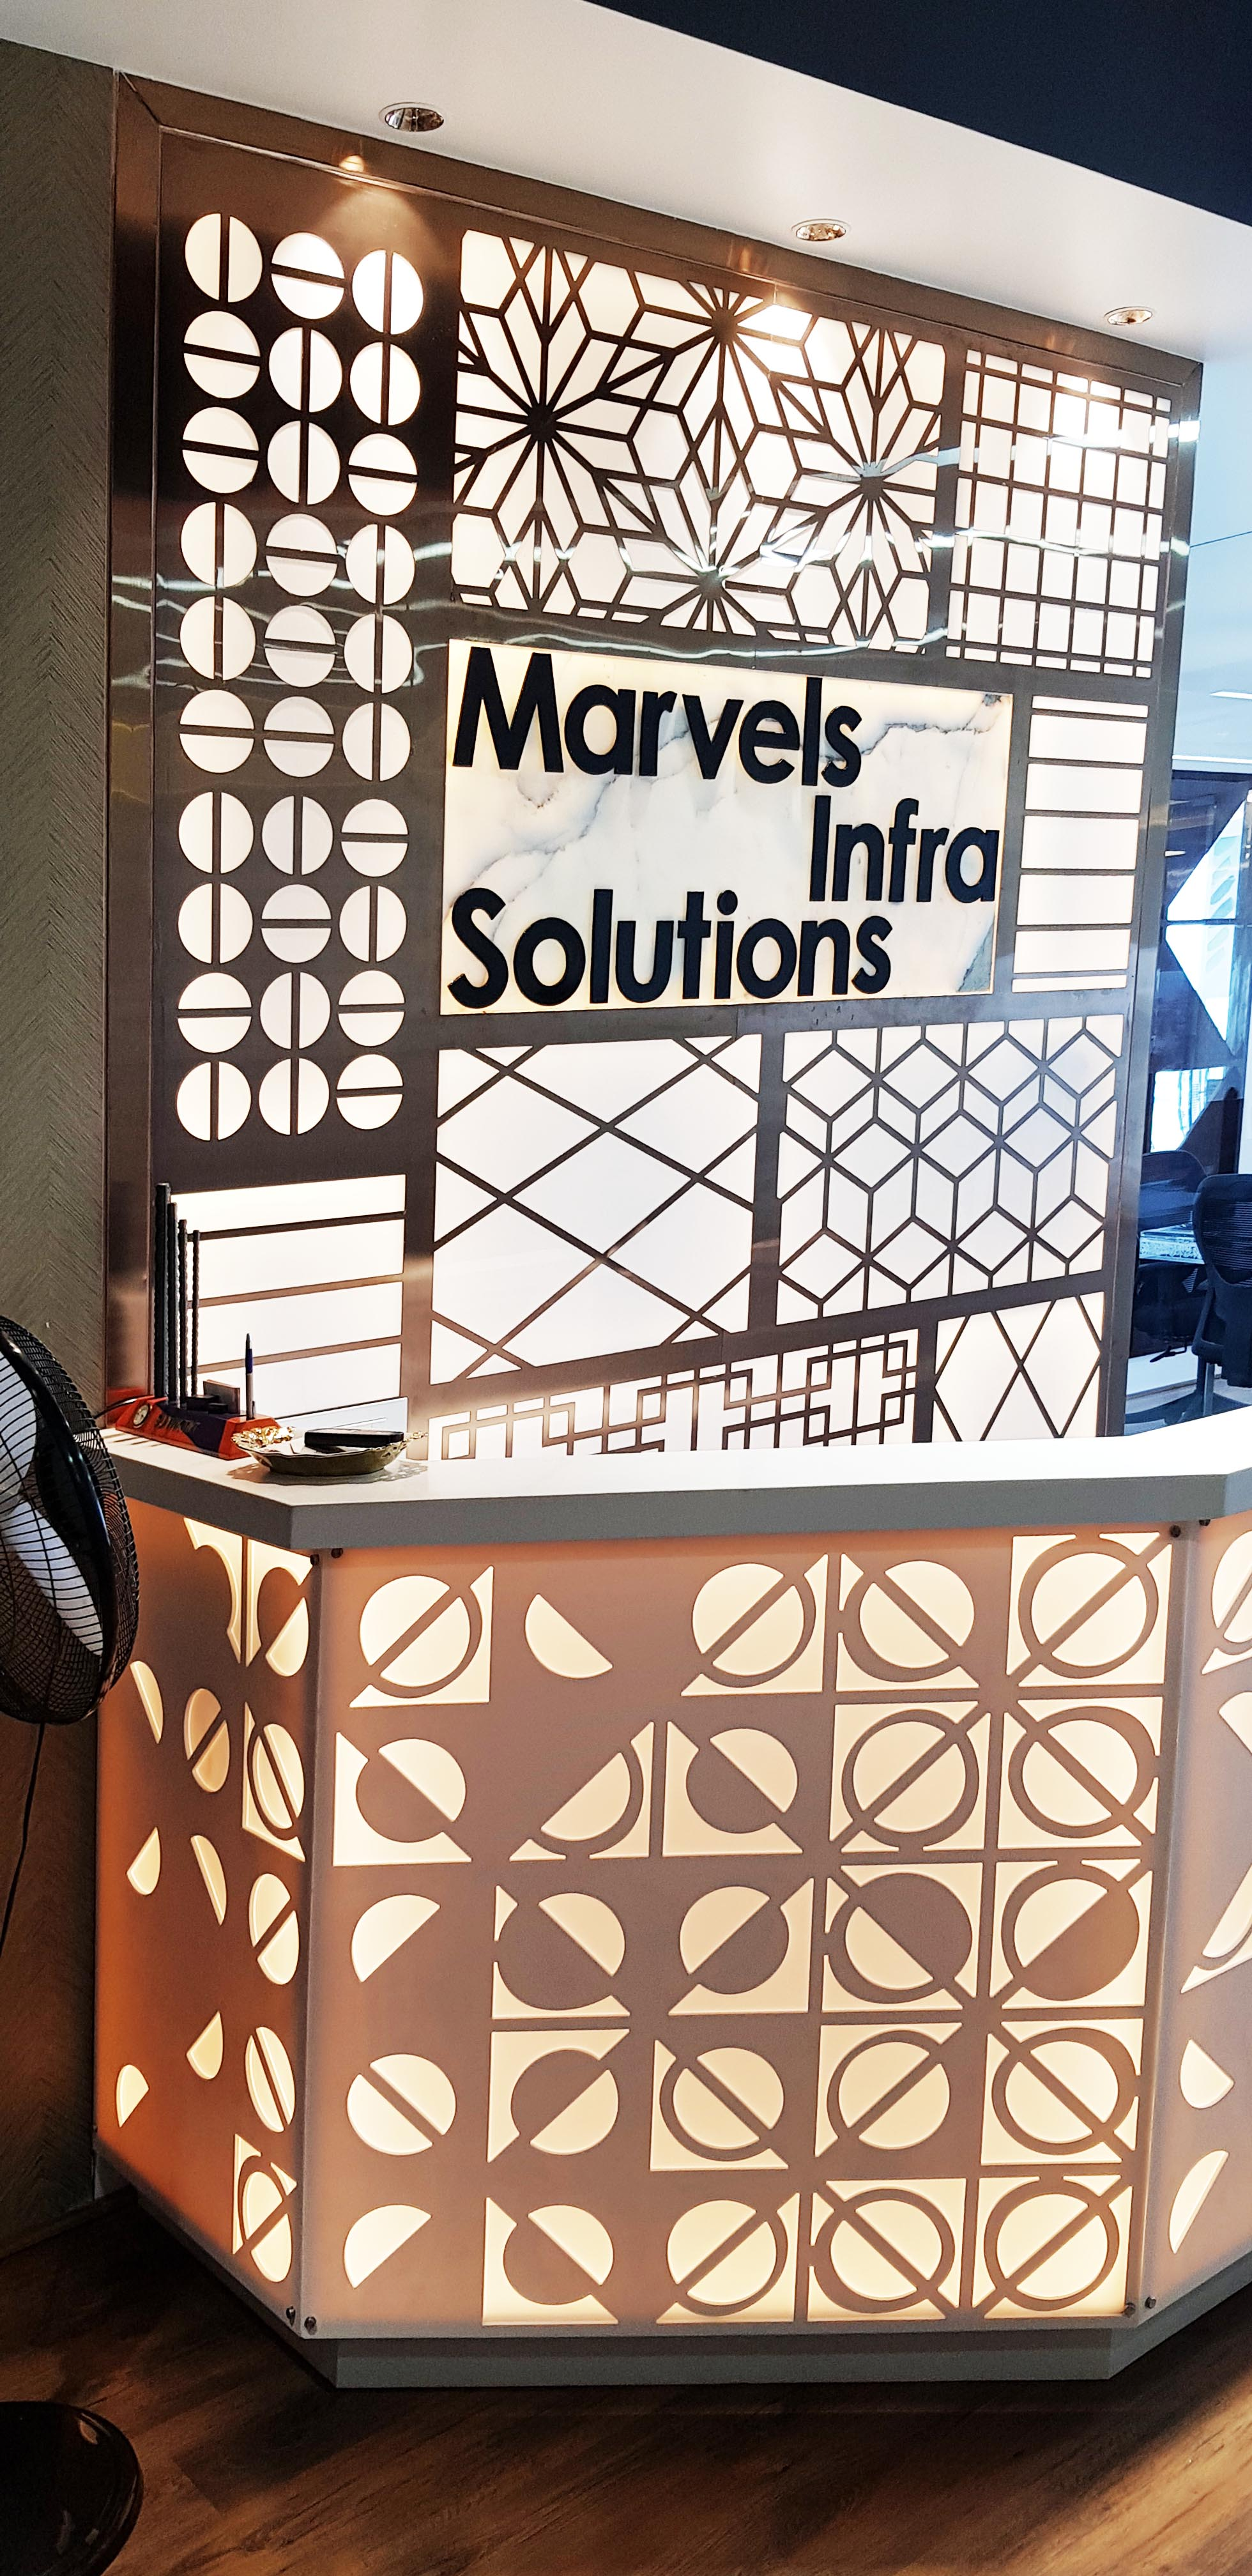 MARVELS INFRA SOLUTIONS